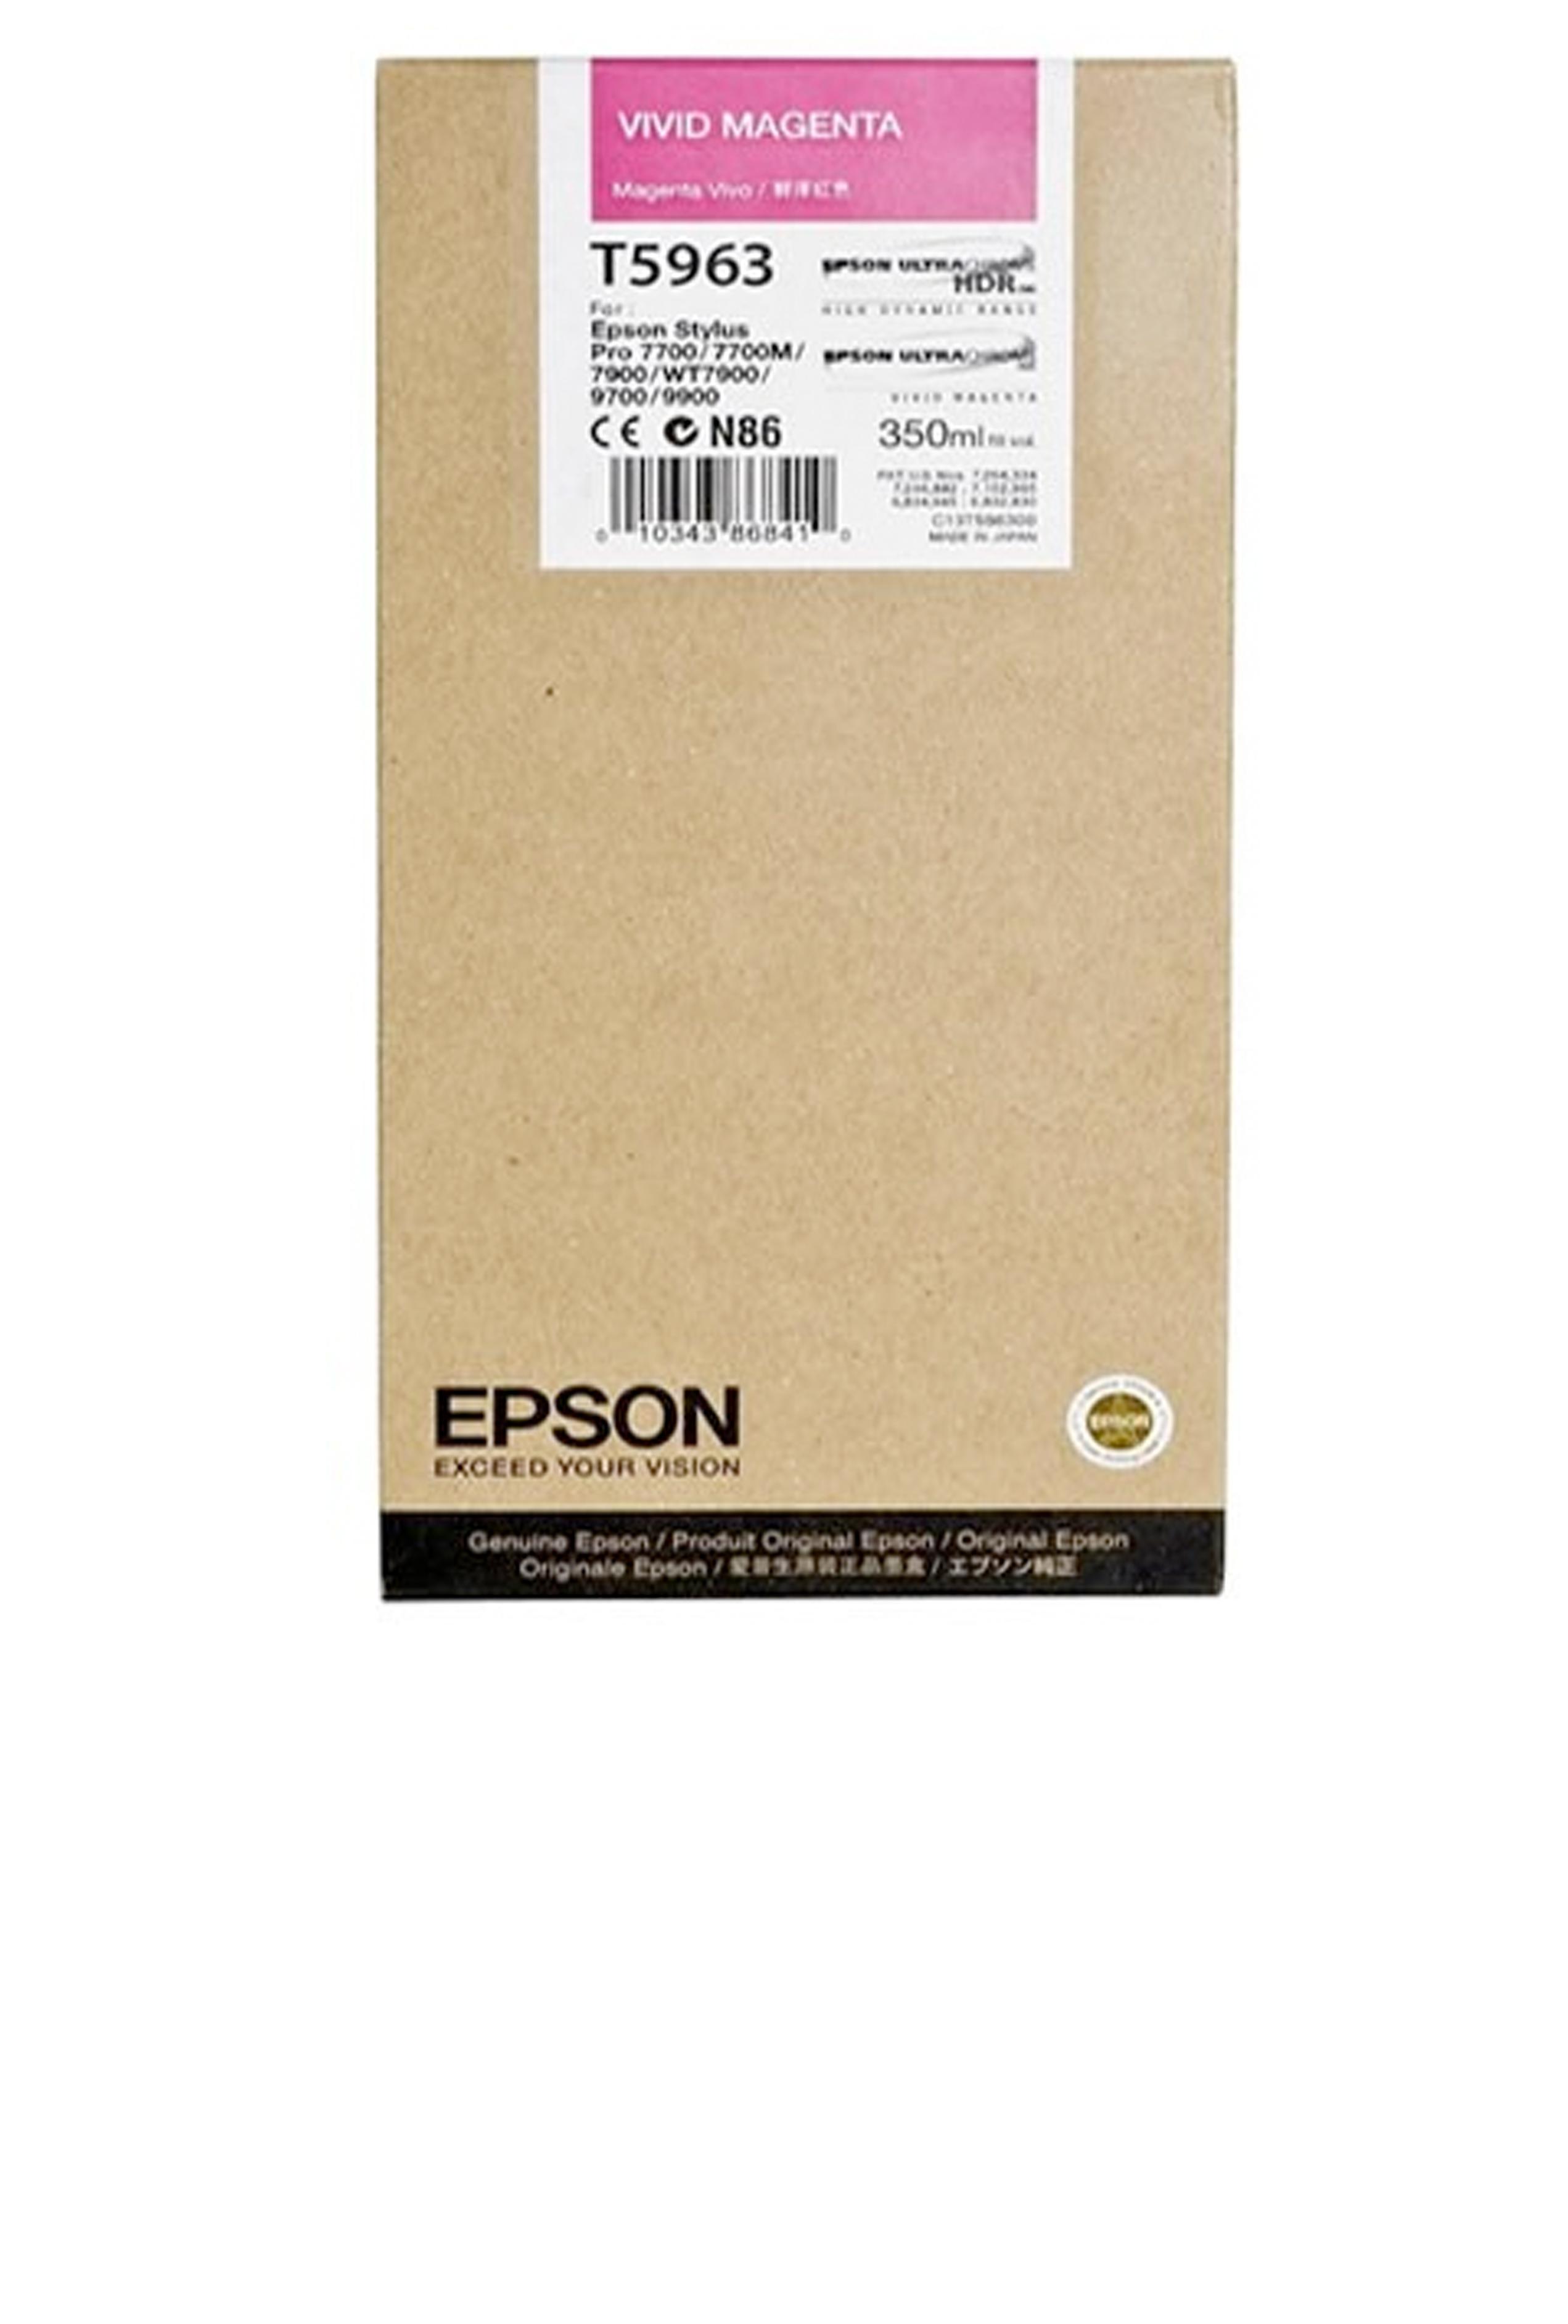 Epson EPSON SD VIVID MAGENTA INK (350 ML) (T596300)